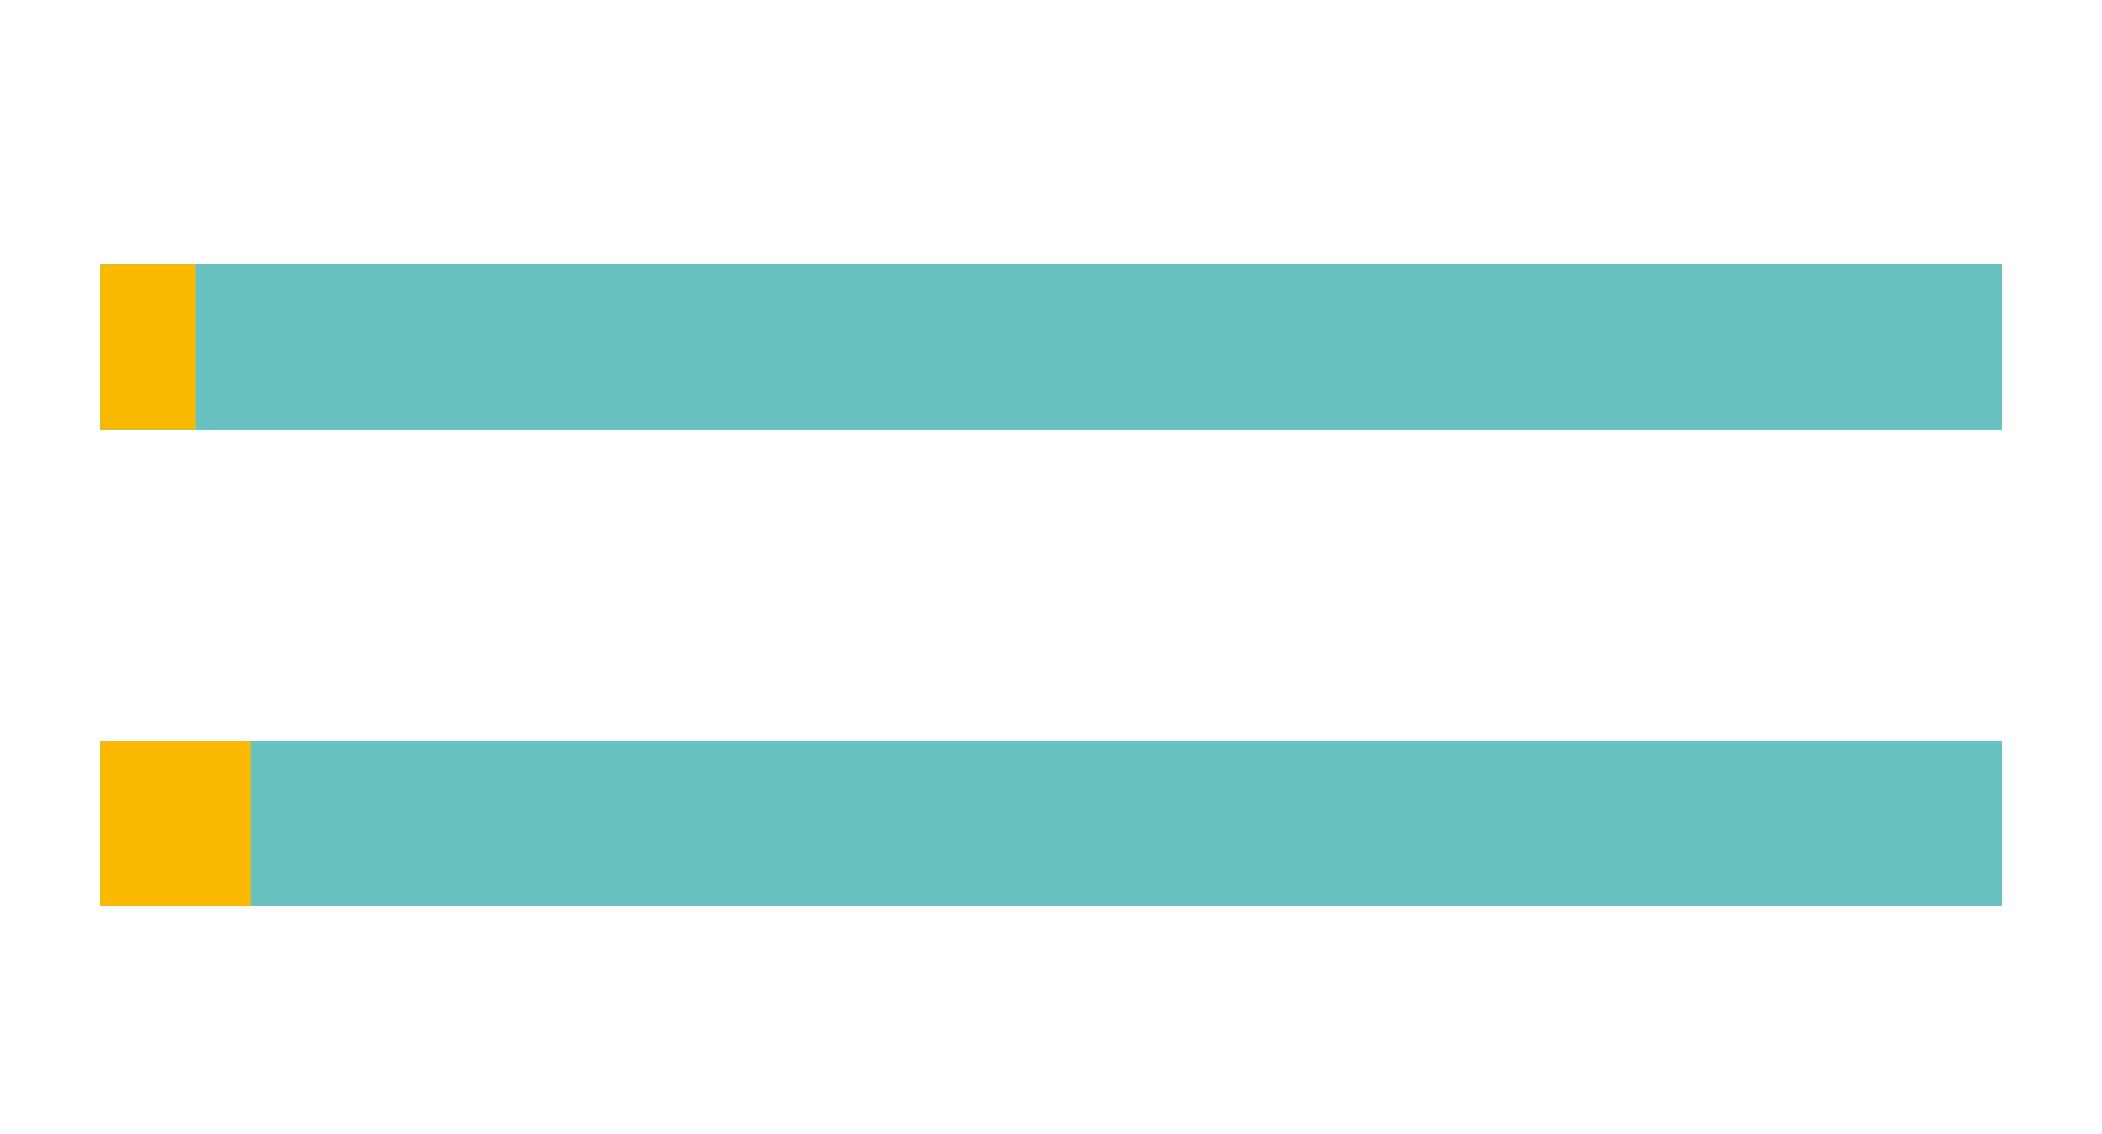 LBQ-specific funding